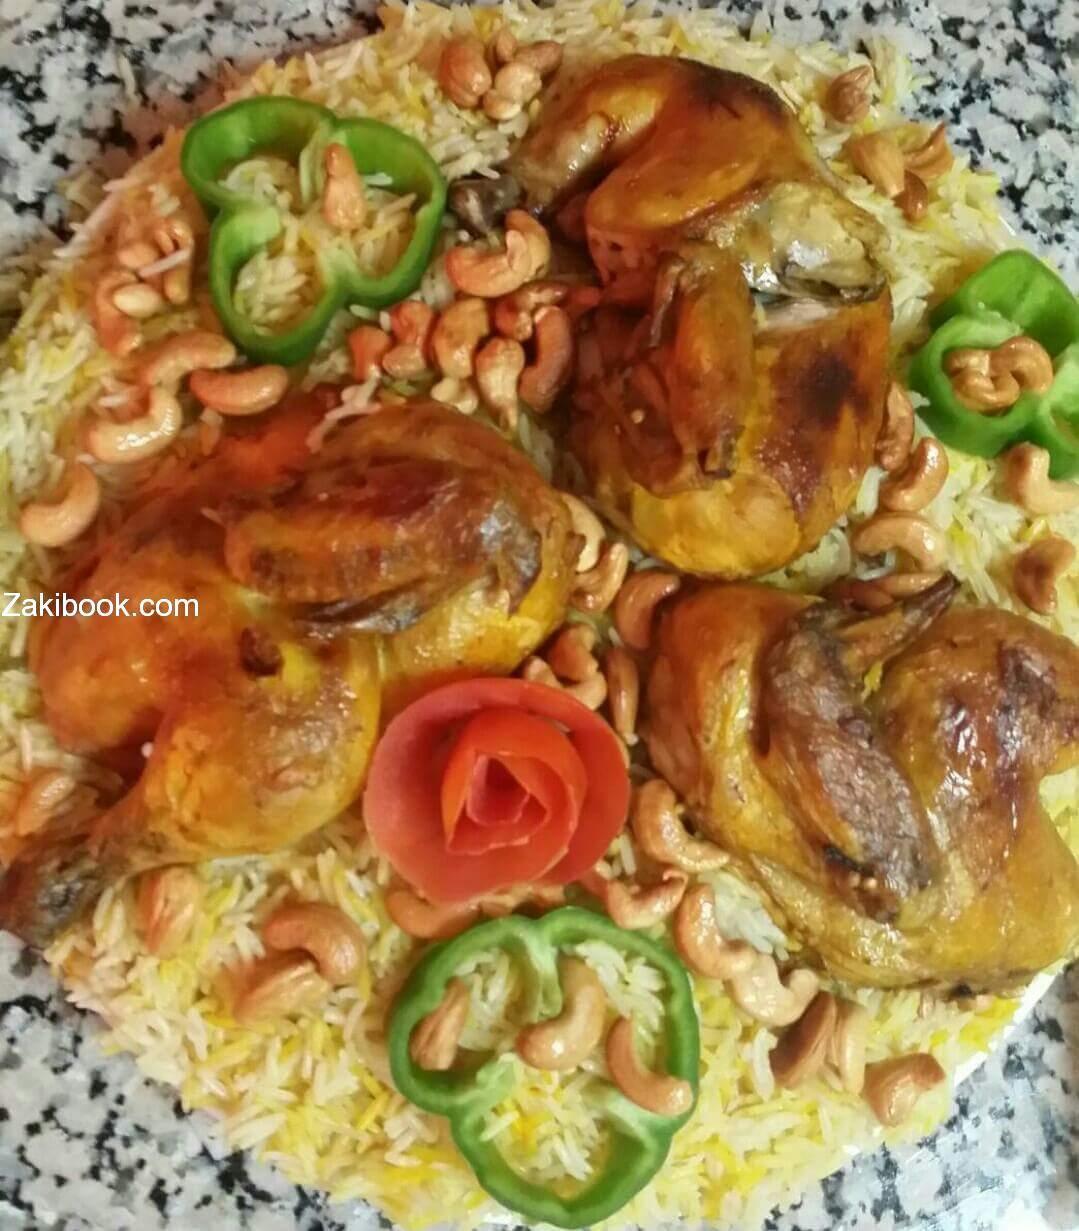 طريقة عمل مندي الدجاج شغل البيت بالصور زاكي Middle Eastern Recipes Food Middle Eastern